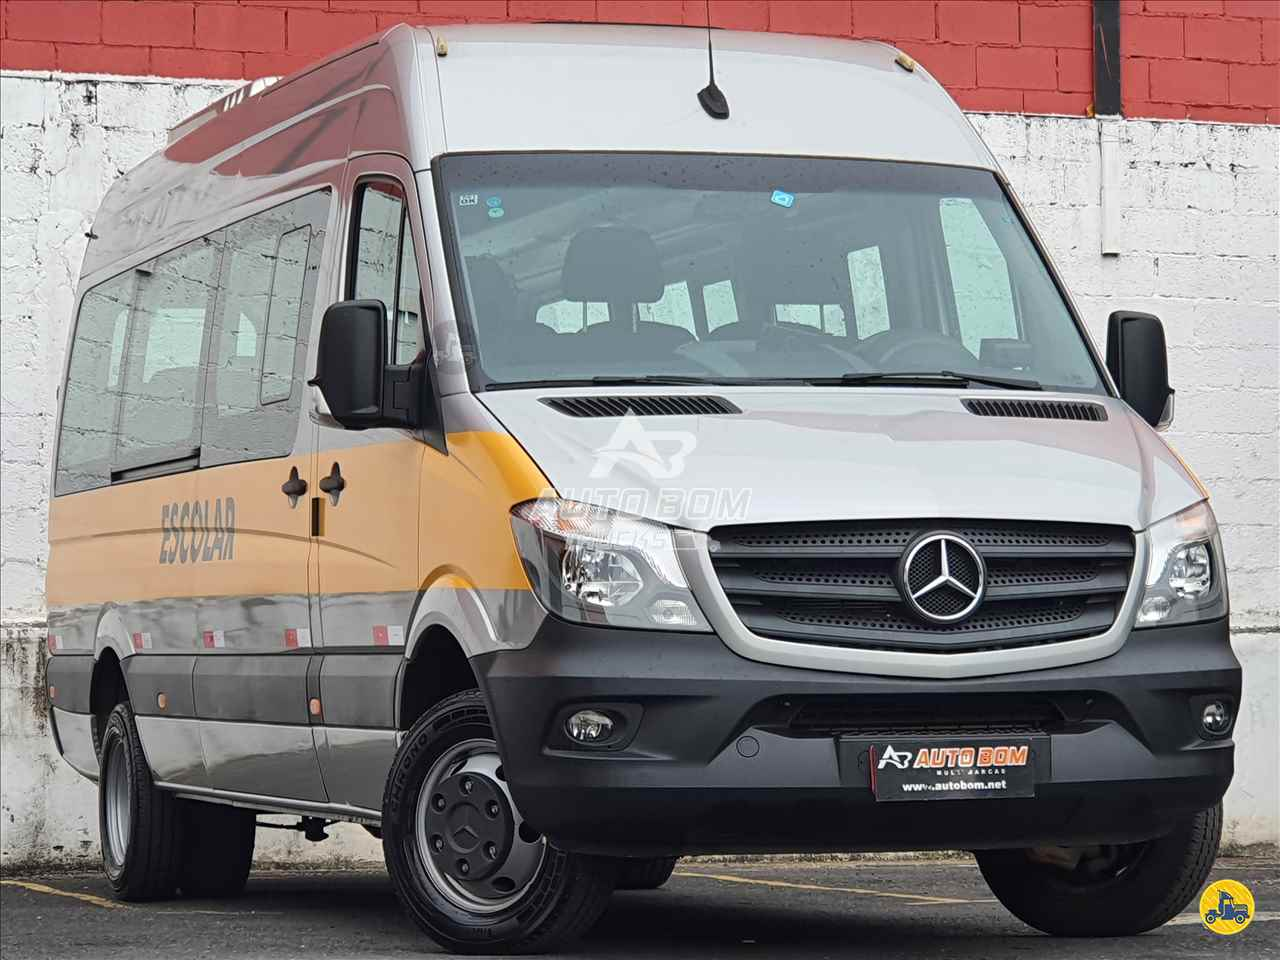 VANS MERCEDES-BENZ Sprinter VAN 515 Autobom Trucks CONTAGEM MINAS GERAIS MG